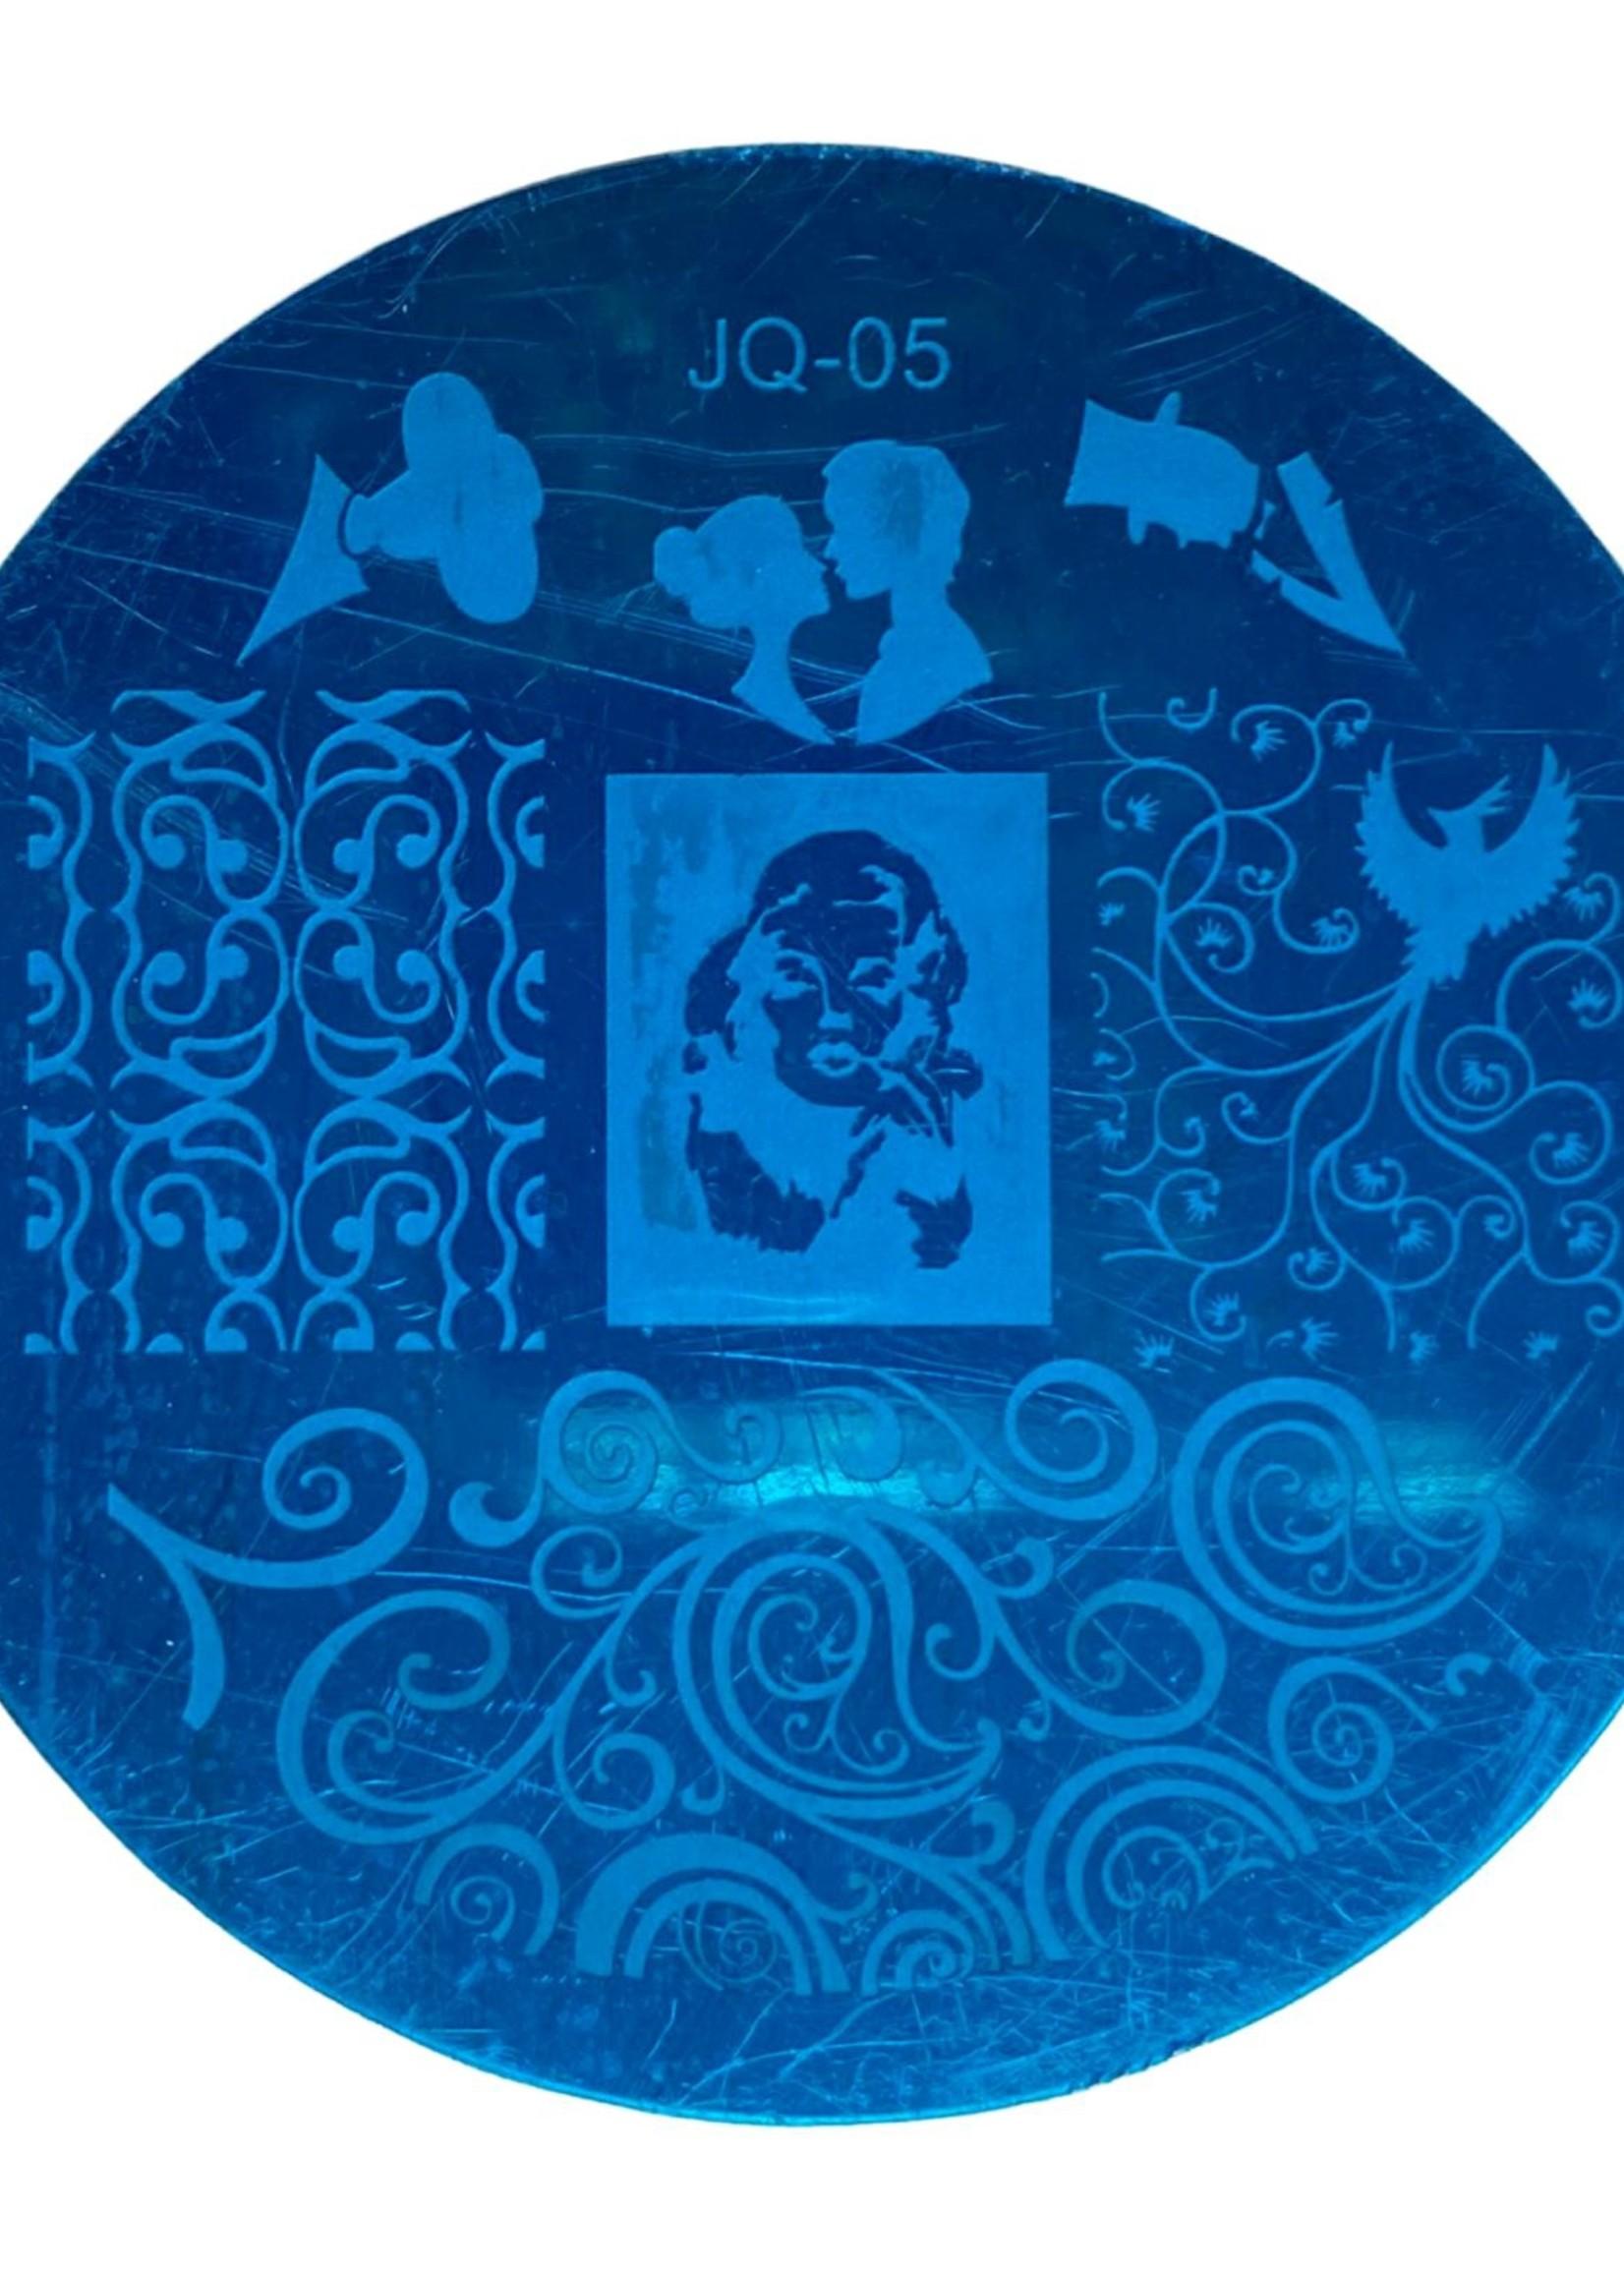 Stamp plate JQ-05